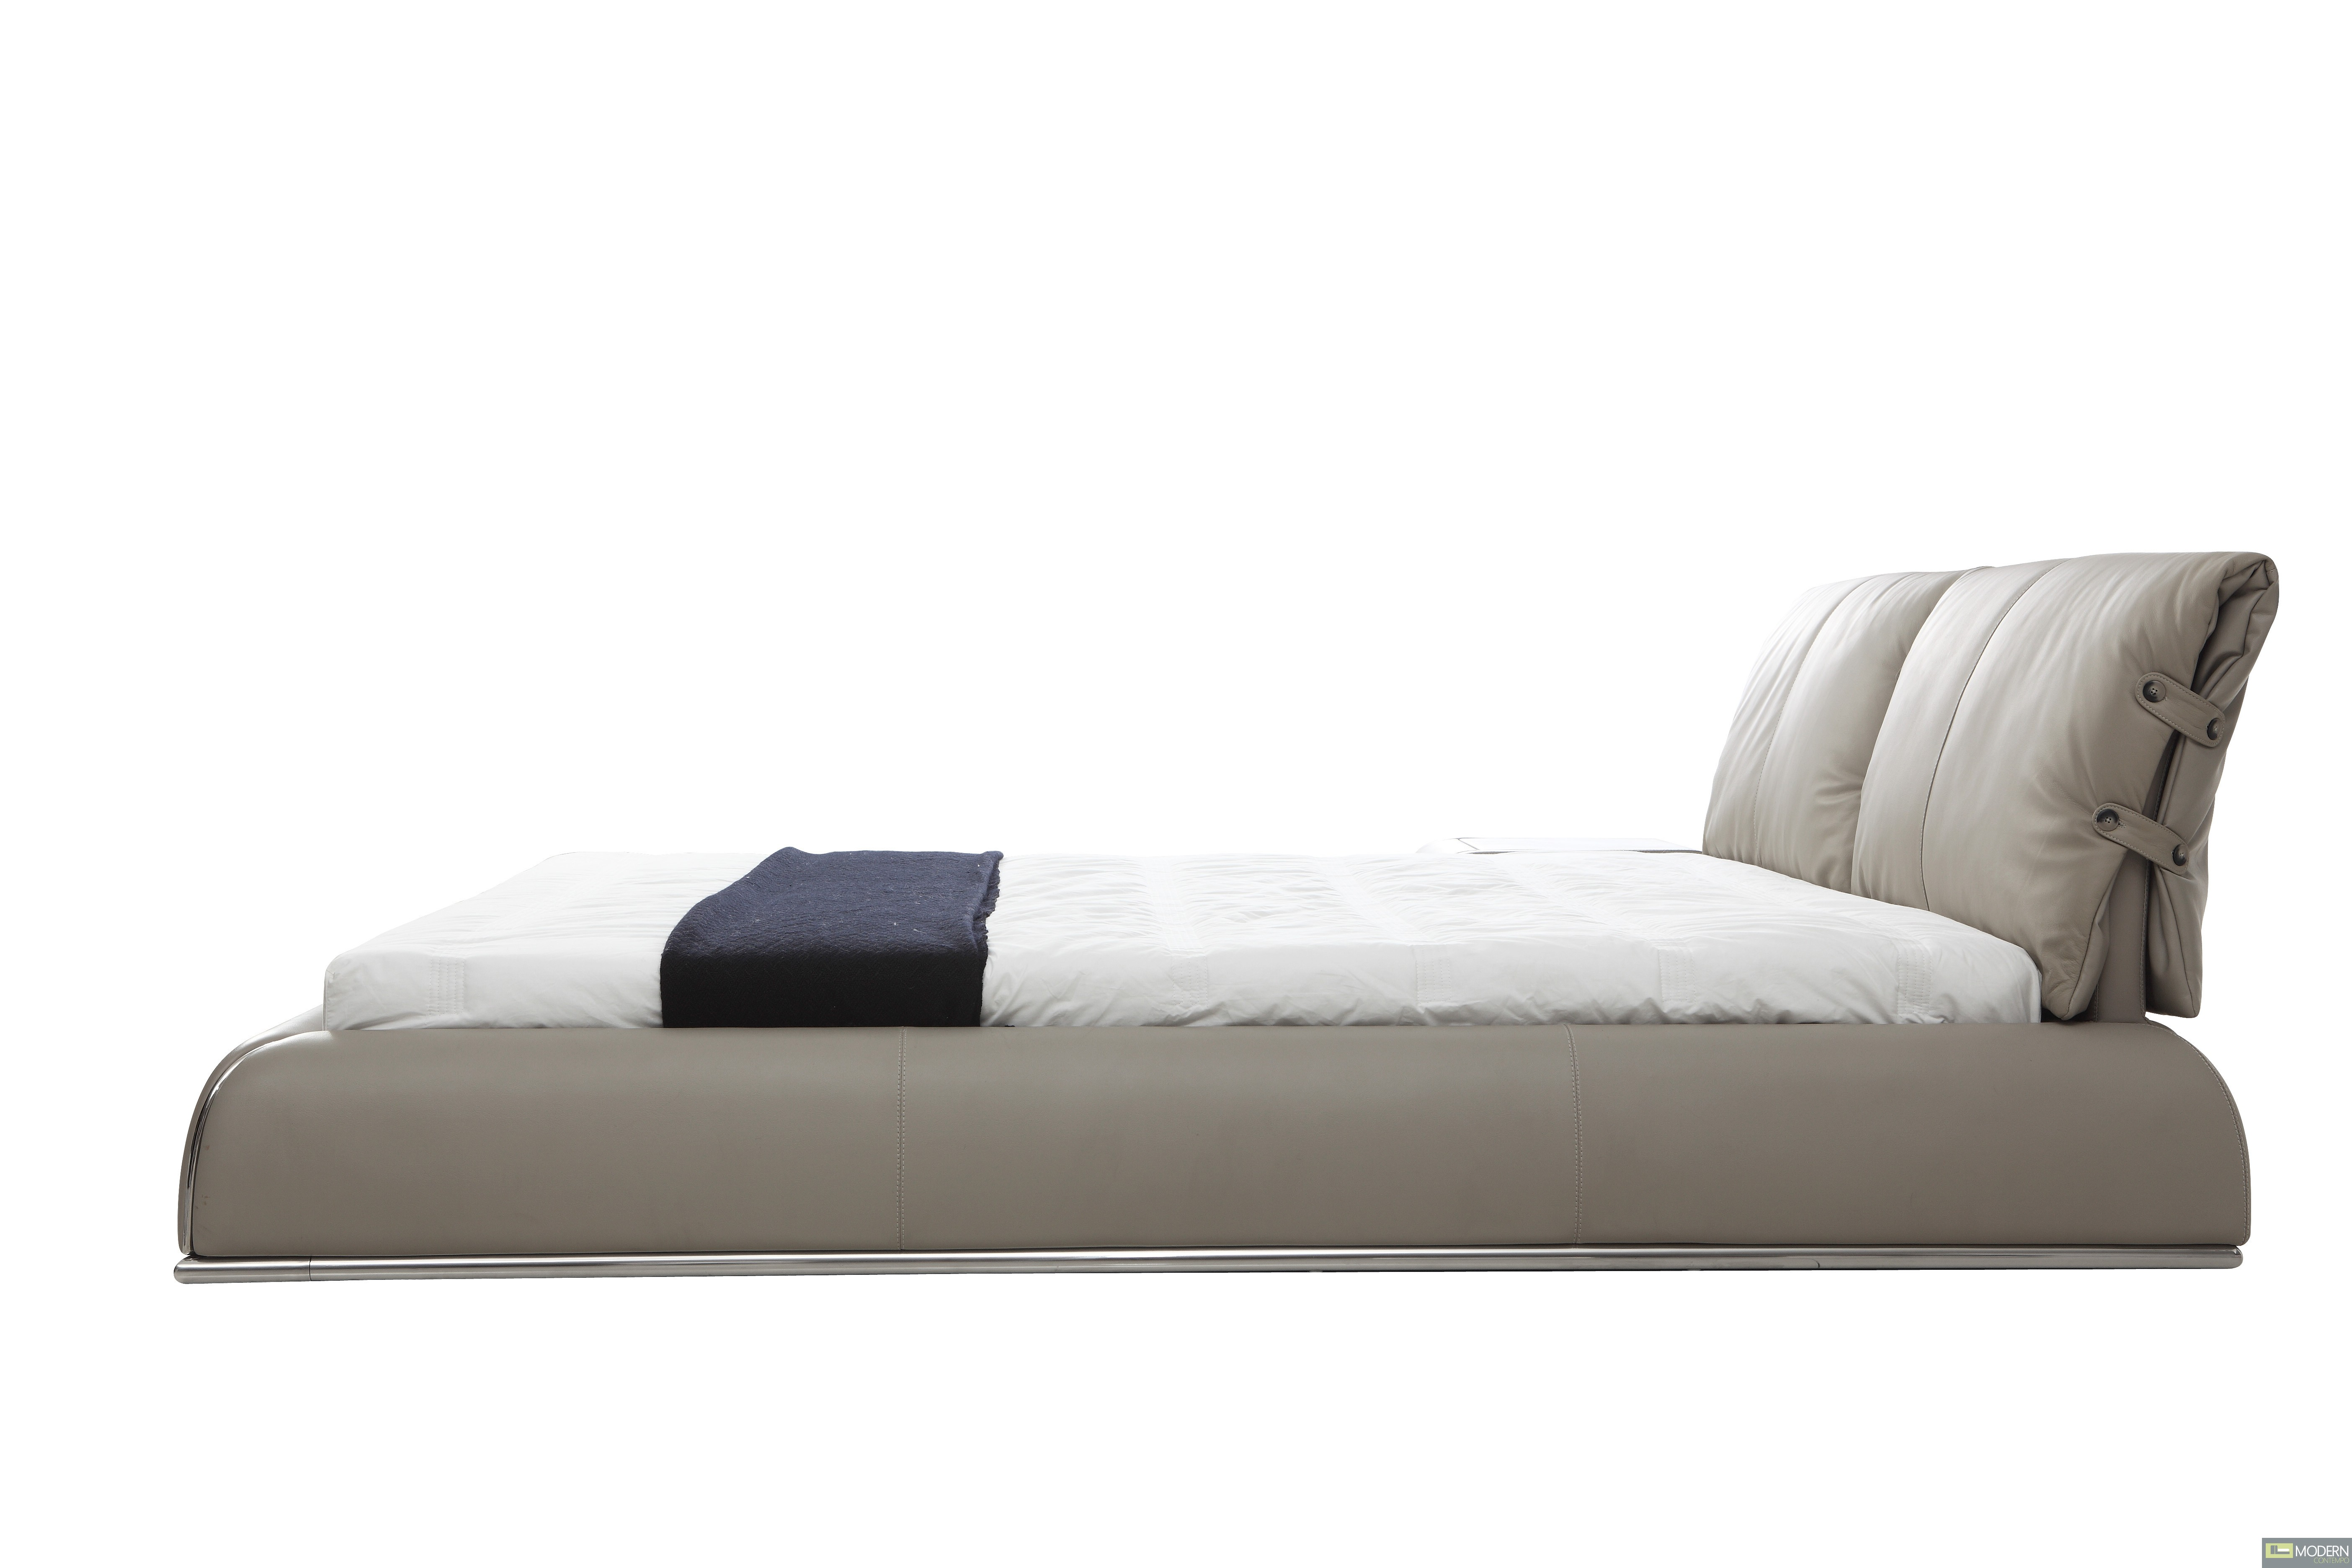 Yeolani Home Modern Contemporary Dark Grey Leather Platform Bed -FADE